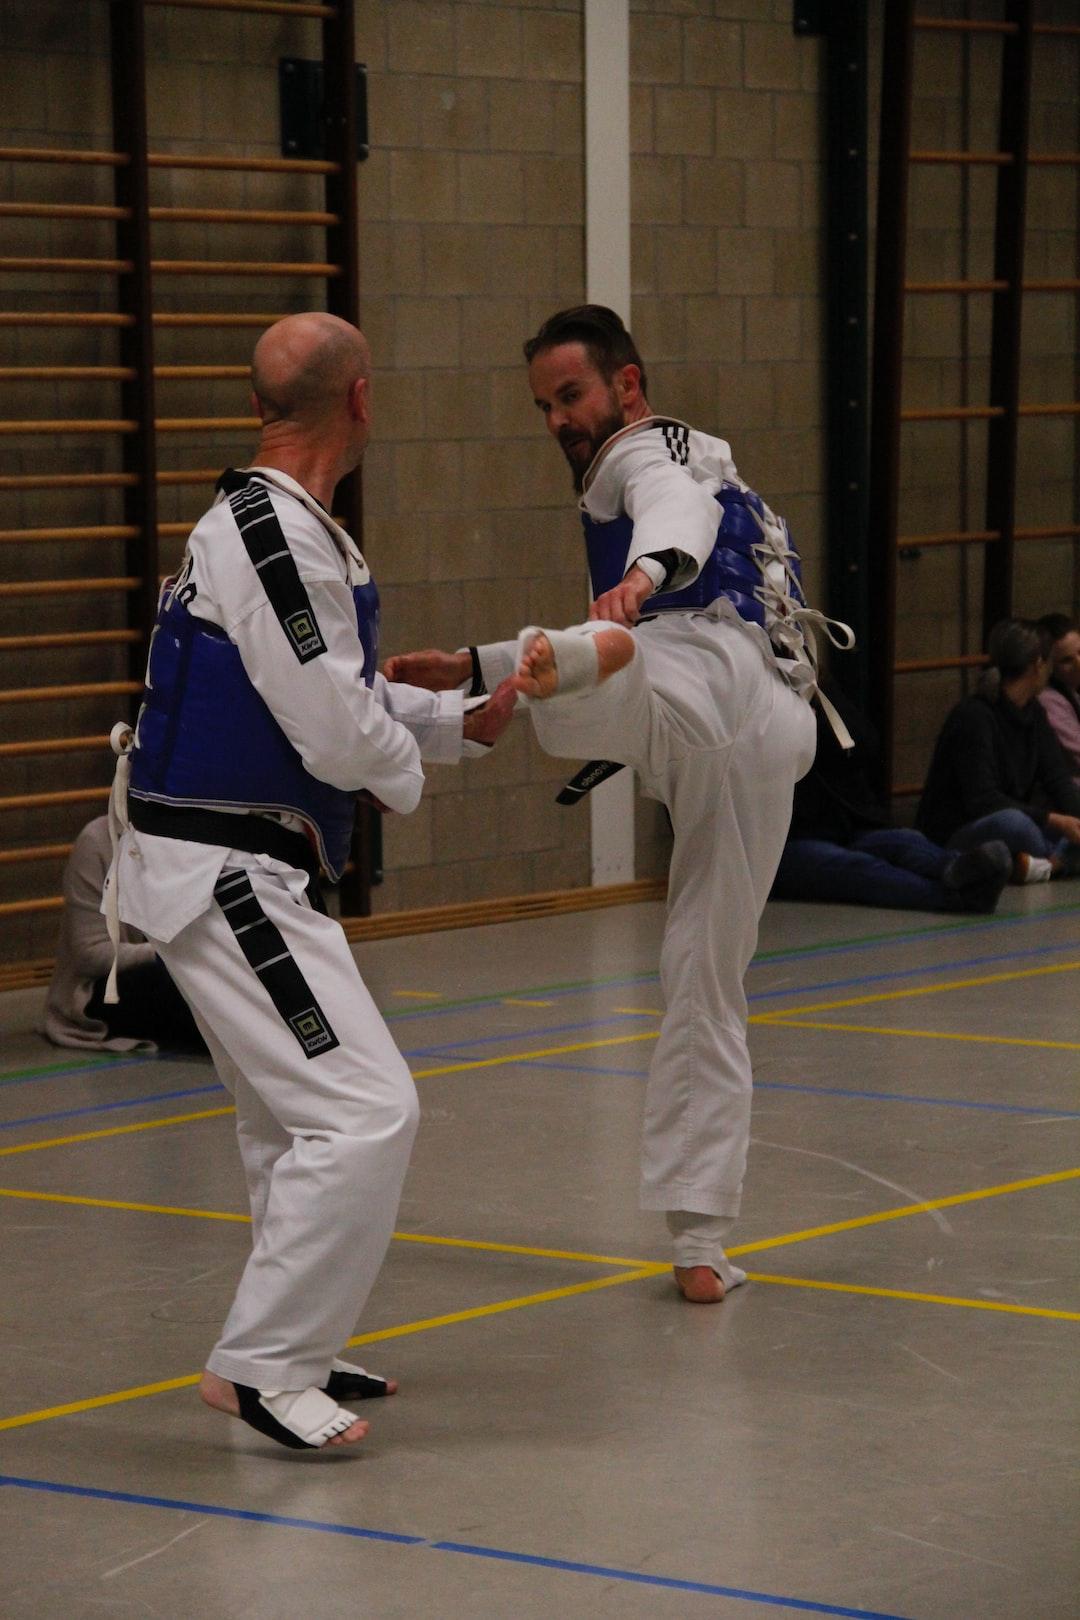 Taekwondo sparring practice. #Better times.